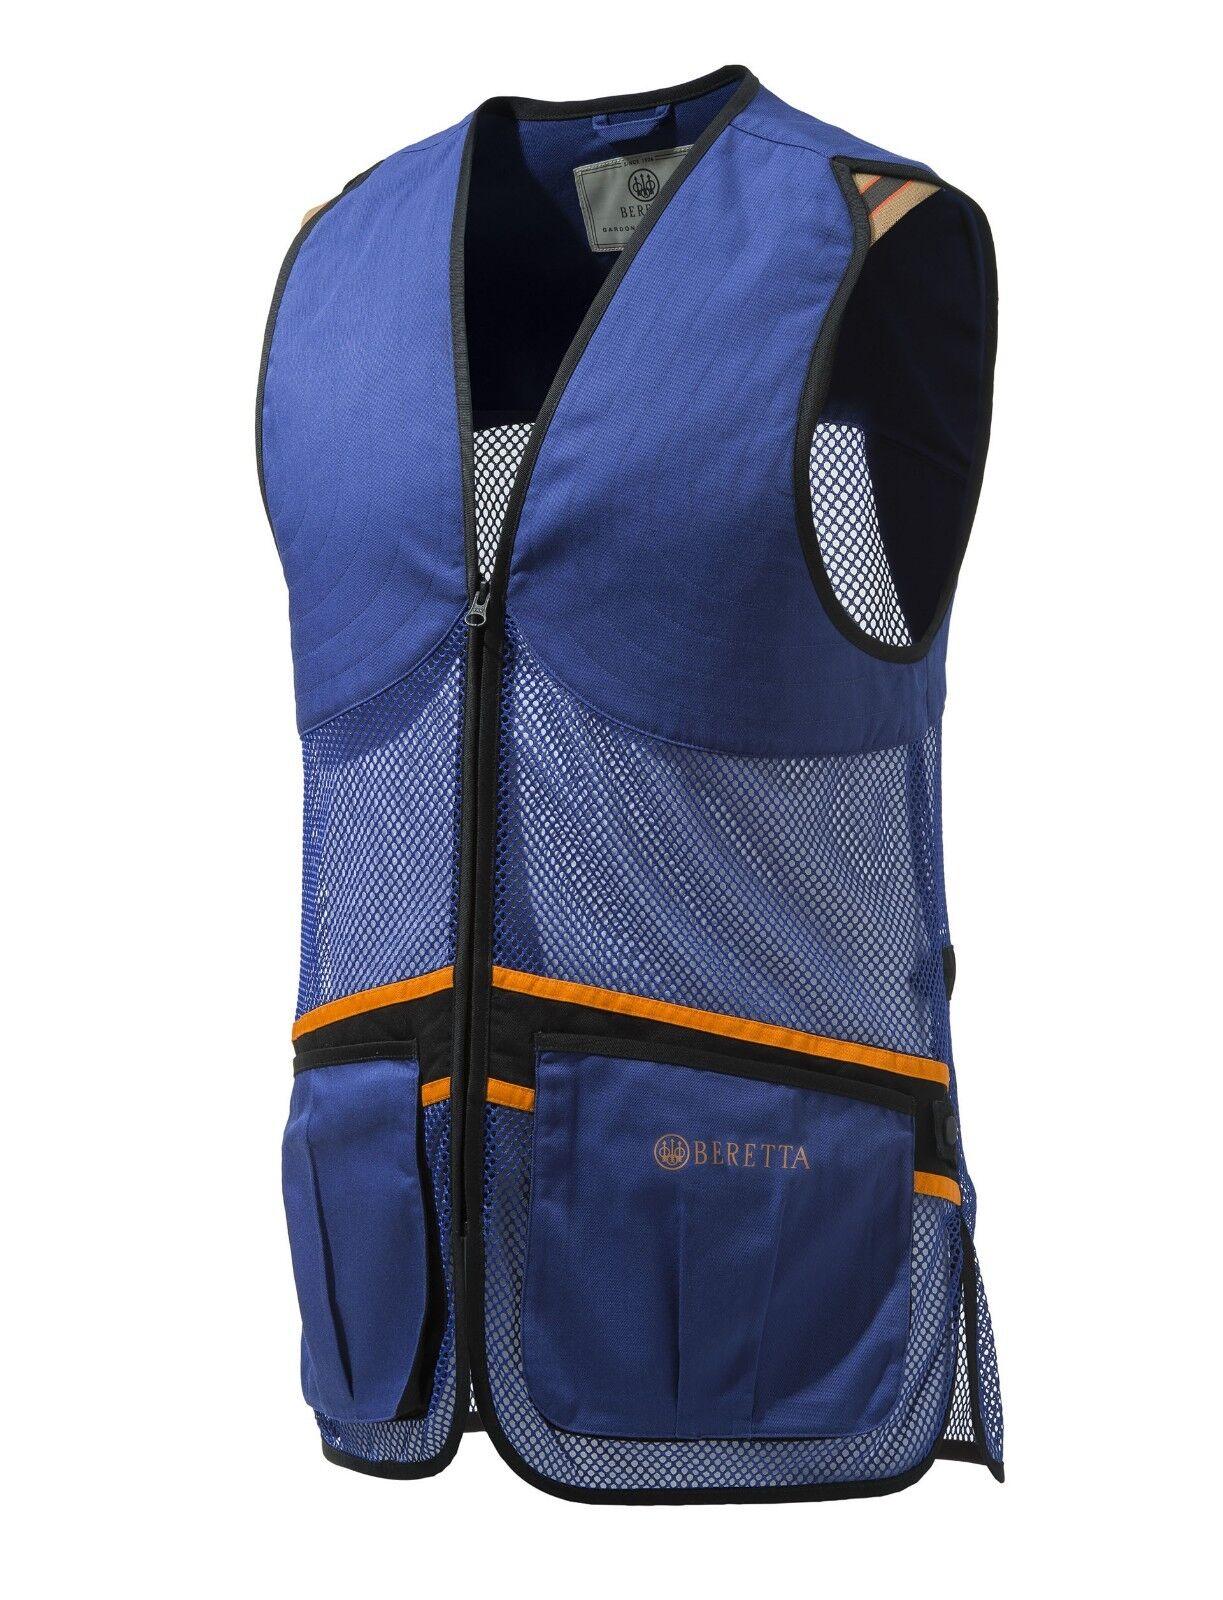 Beretta Full Mesh Clay Shooting Vest